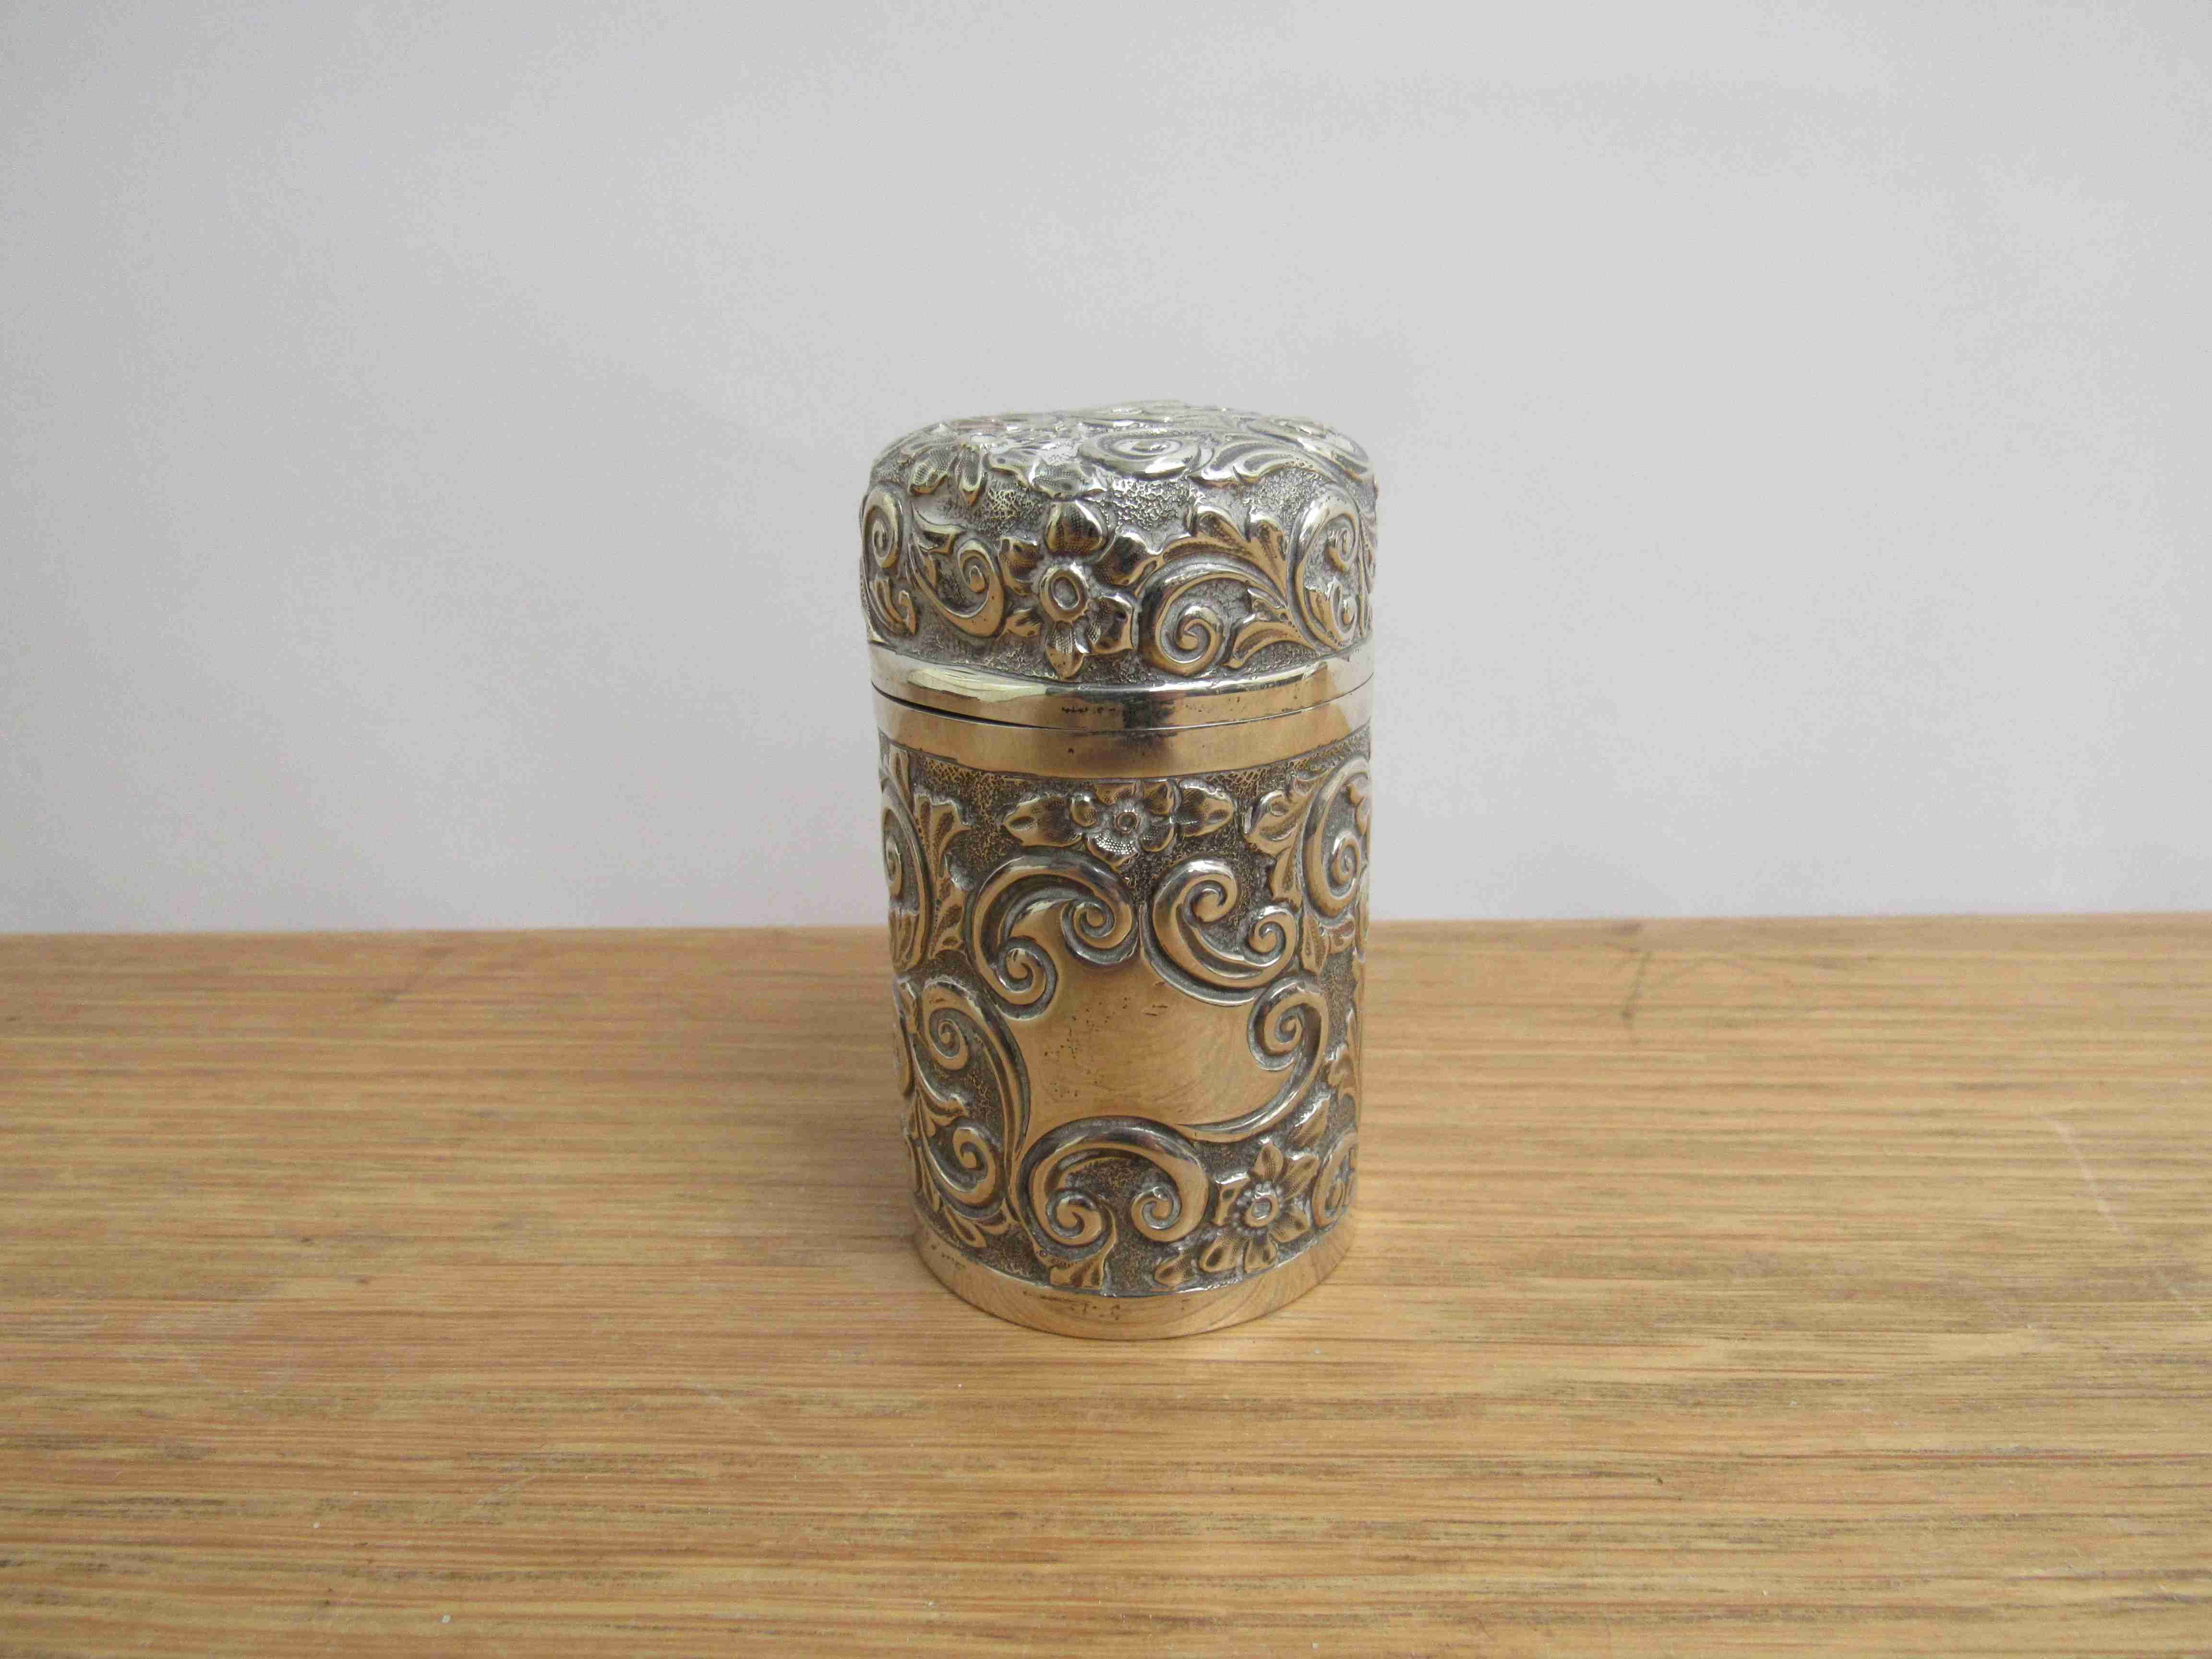 Lot 8 - An Arthur Willmore Pennington floral embossed silver scent bottle, slight dents,